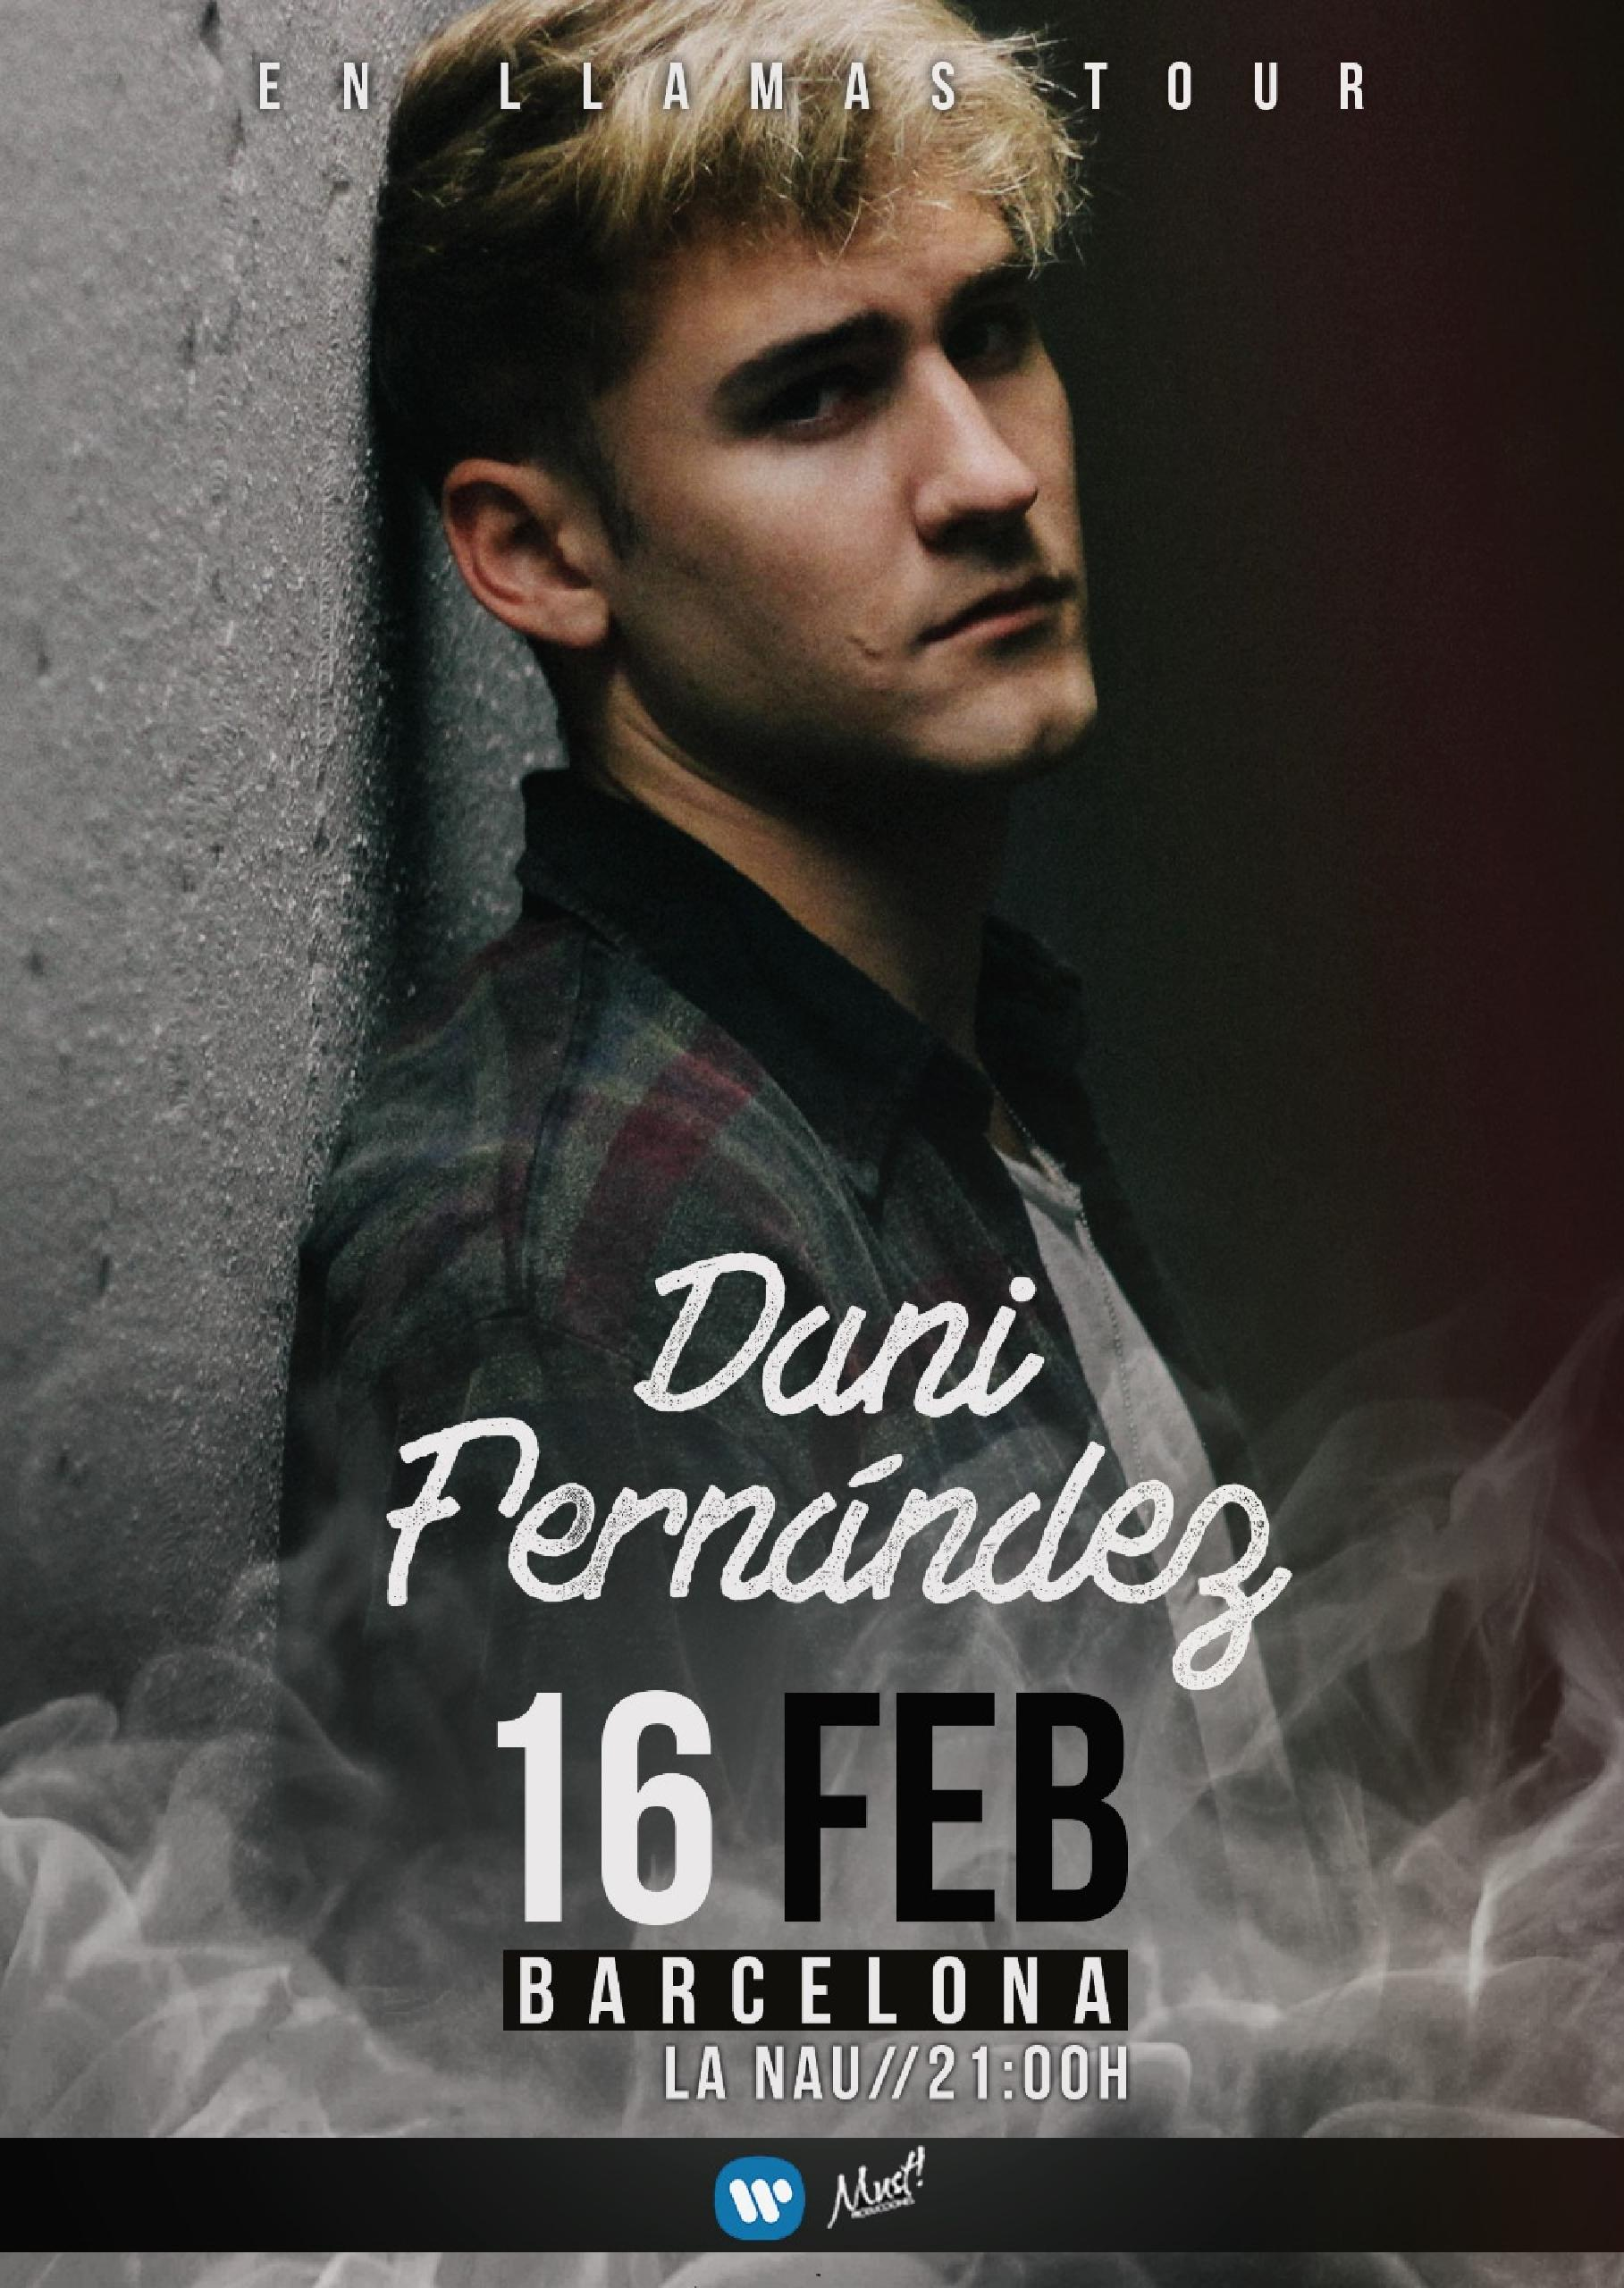 Dani Fernandez